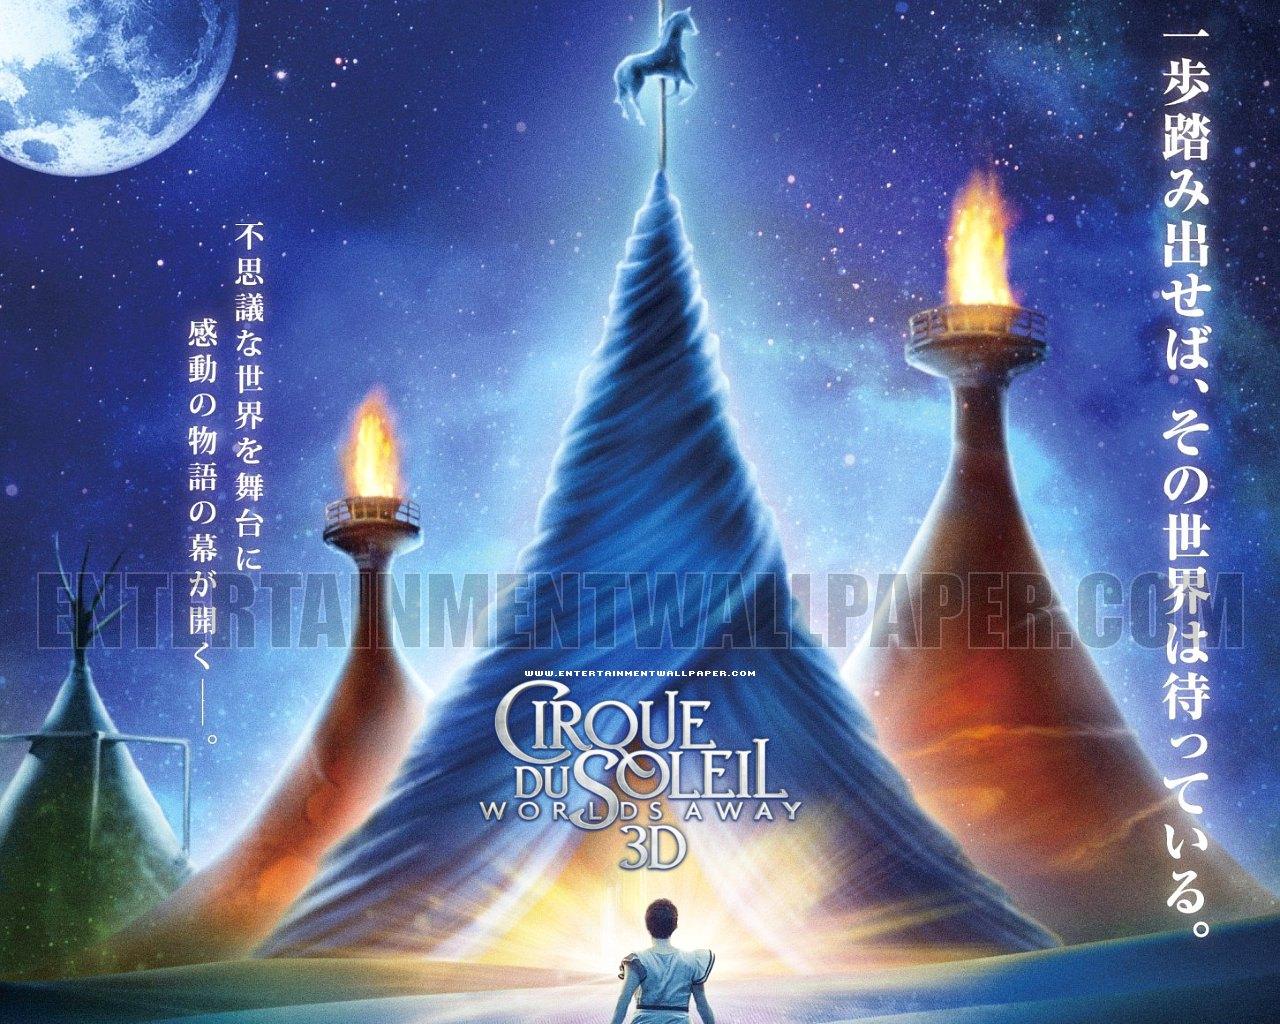 Cirque du Soleil Worlds Away Wallpaper   Original size download now 1280x1024